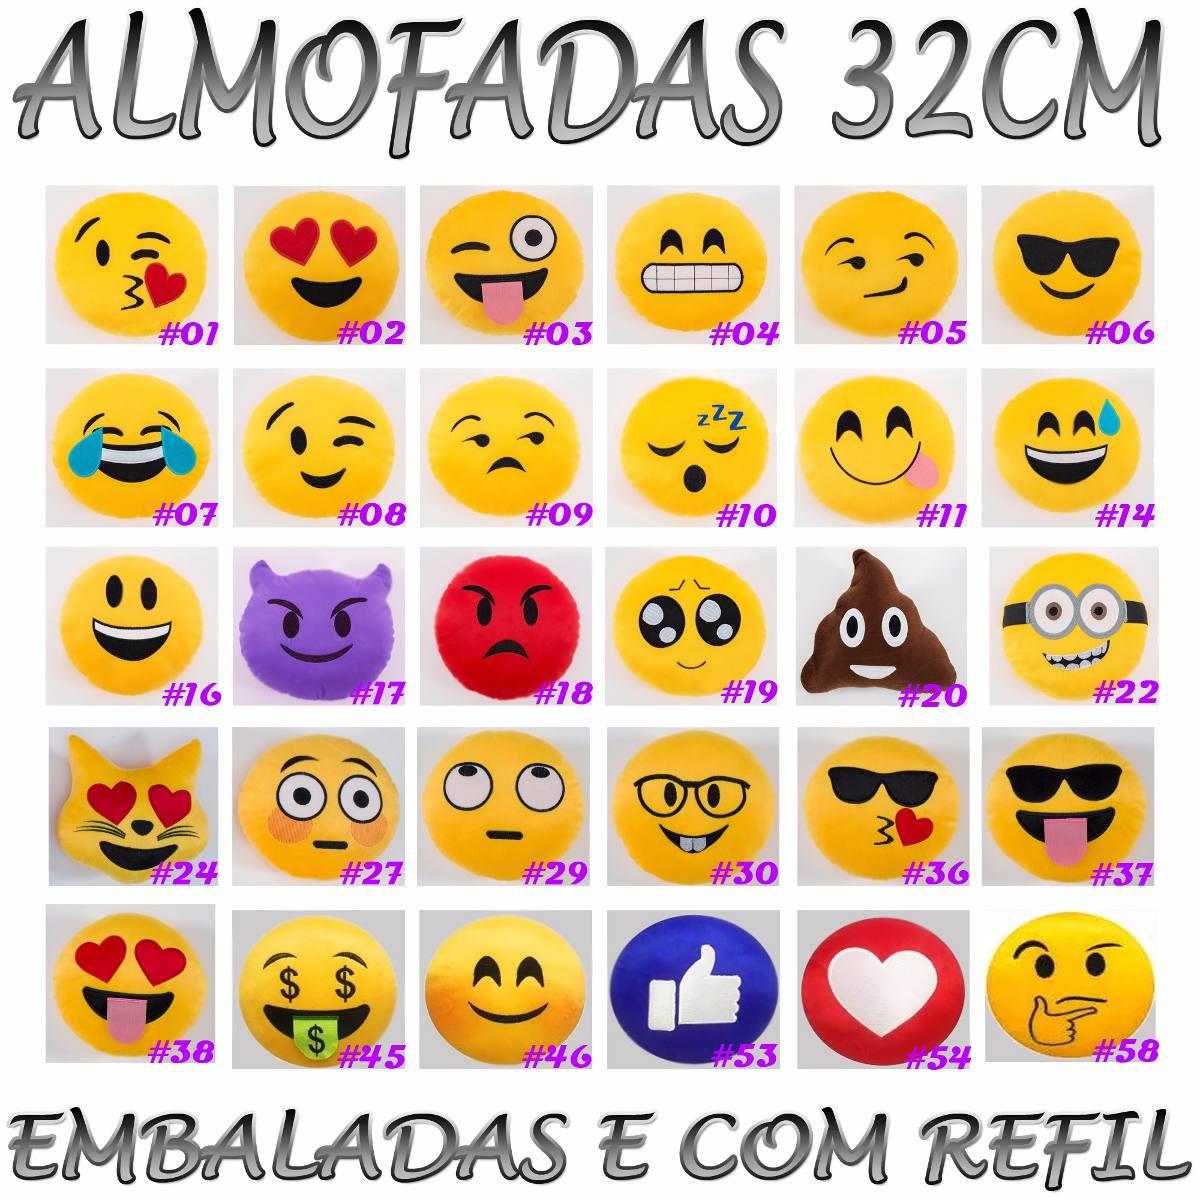 ad48496f488889 Kit 30 Almofada Emoticon Zapzap Watts App Emoji 32cm Bordado